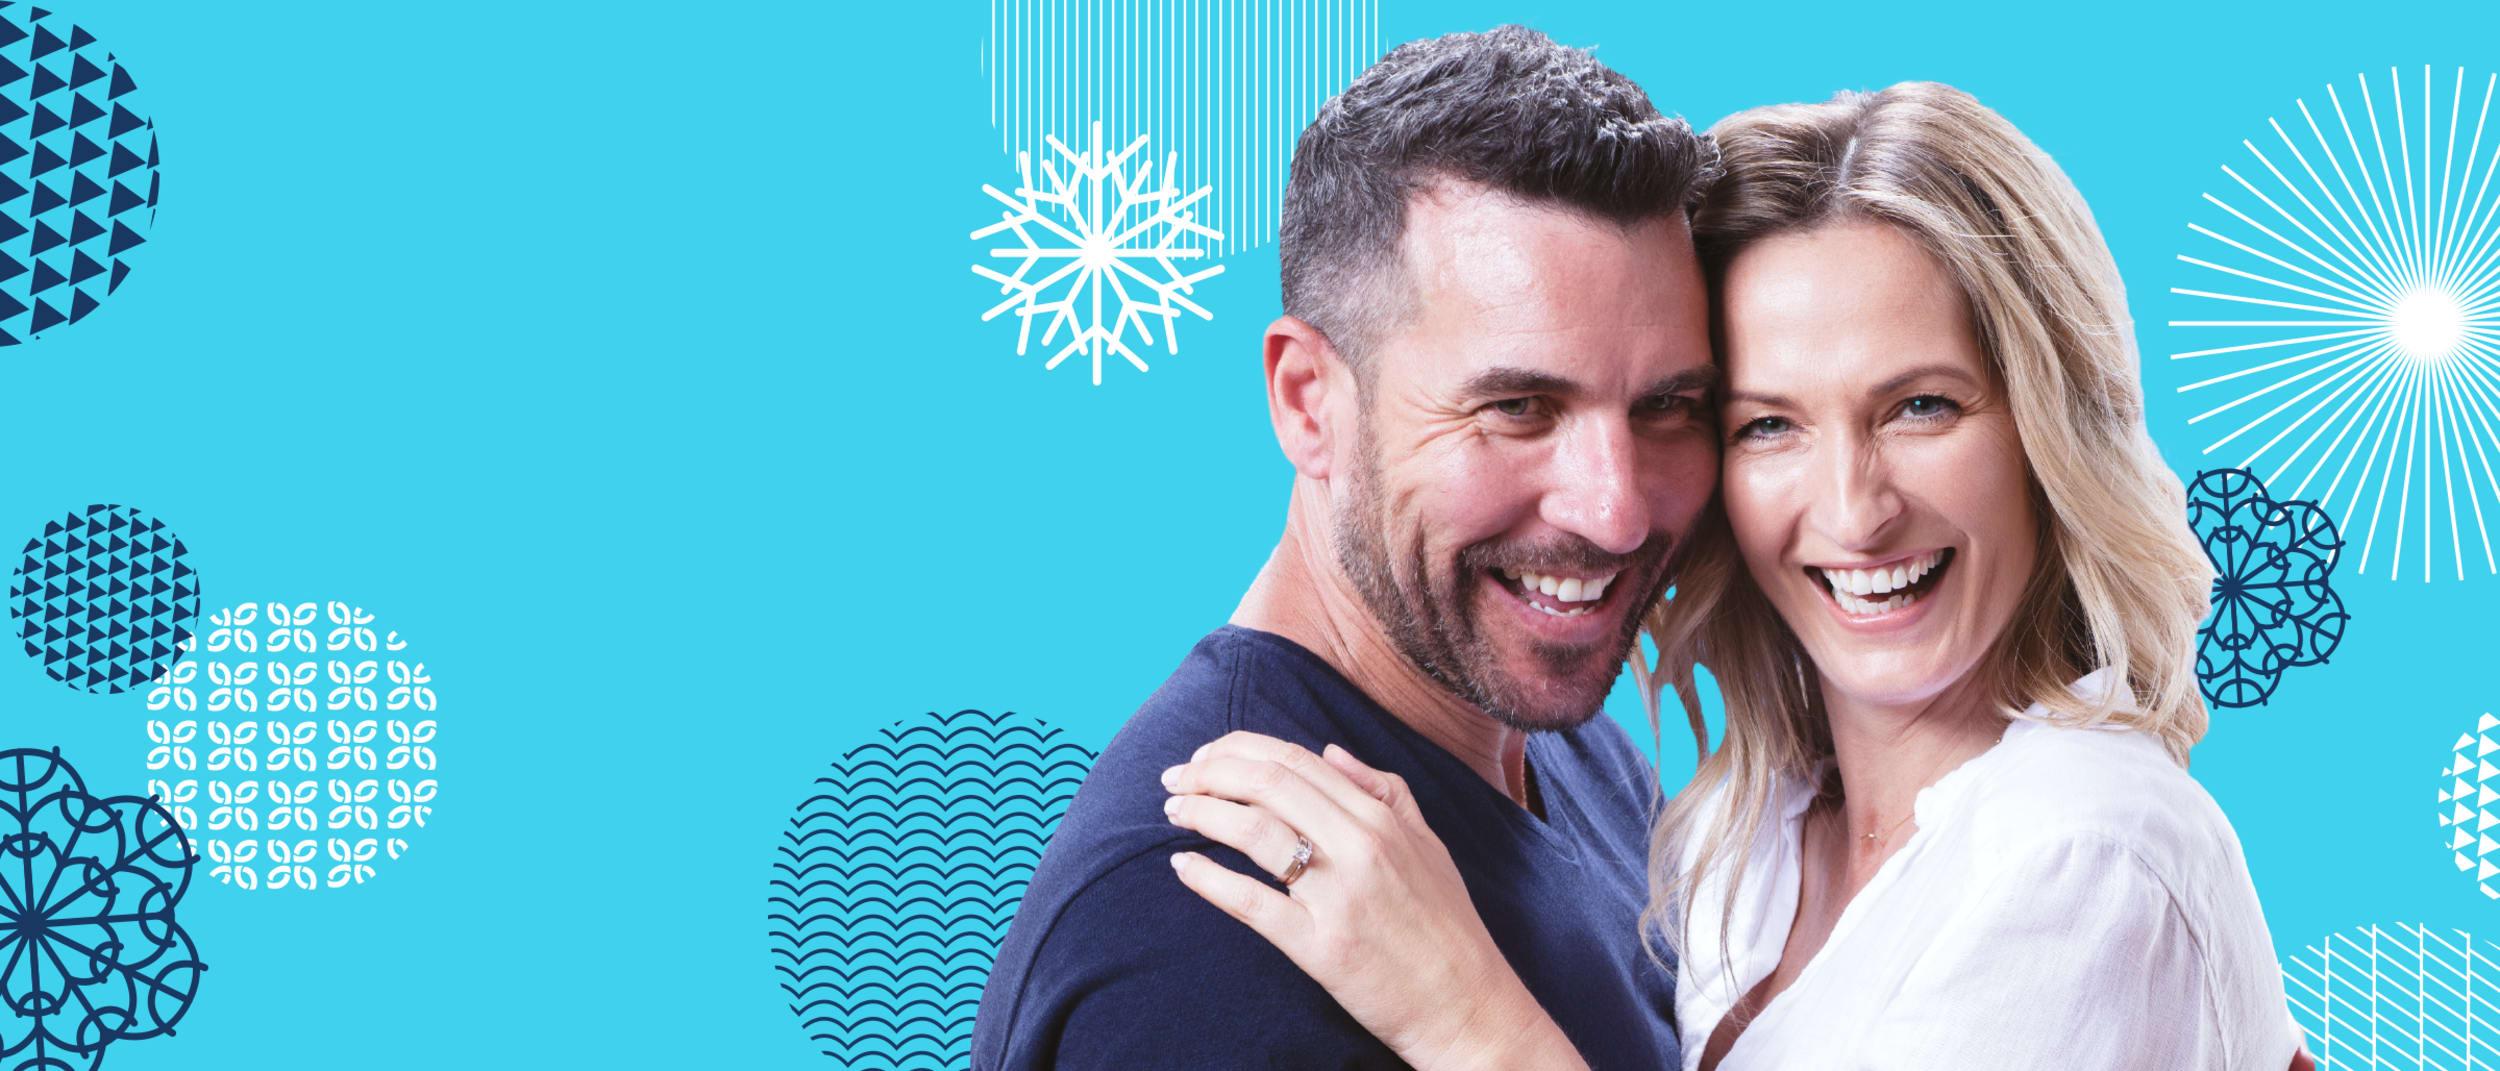 Australian Skin Clinics: Let it glow! Give the gift of great skin